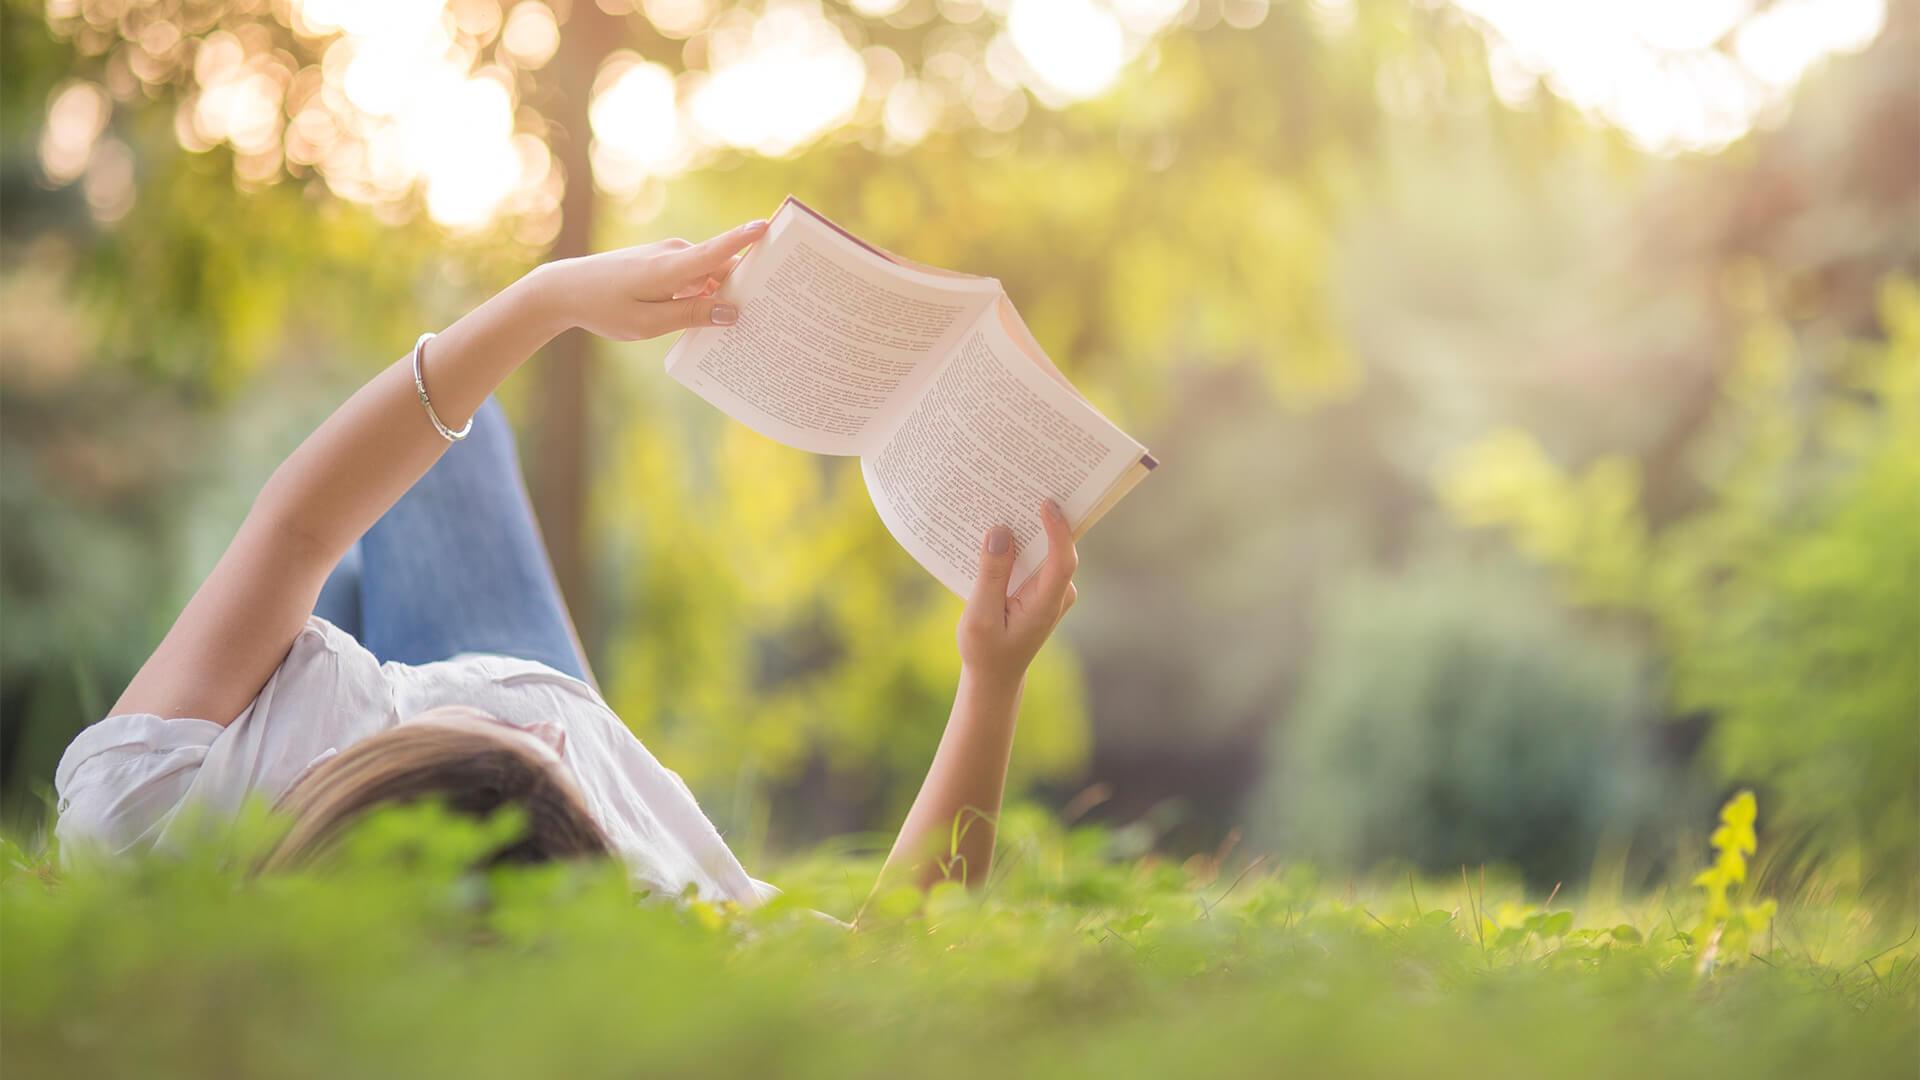 Christ-Centered Gifts for New Beginnings